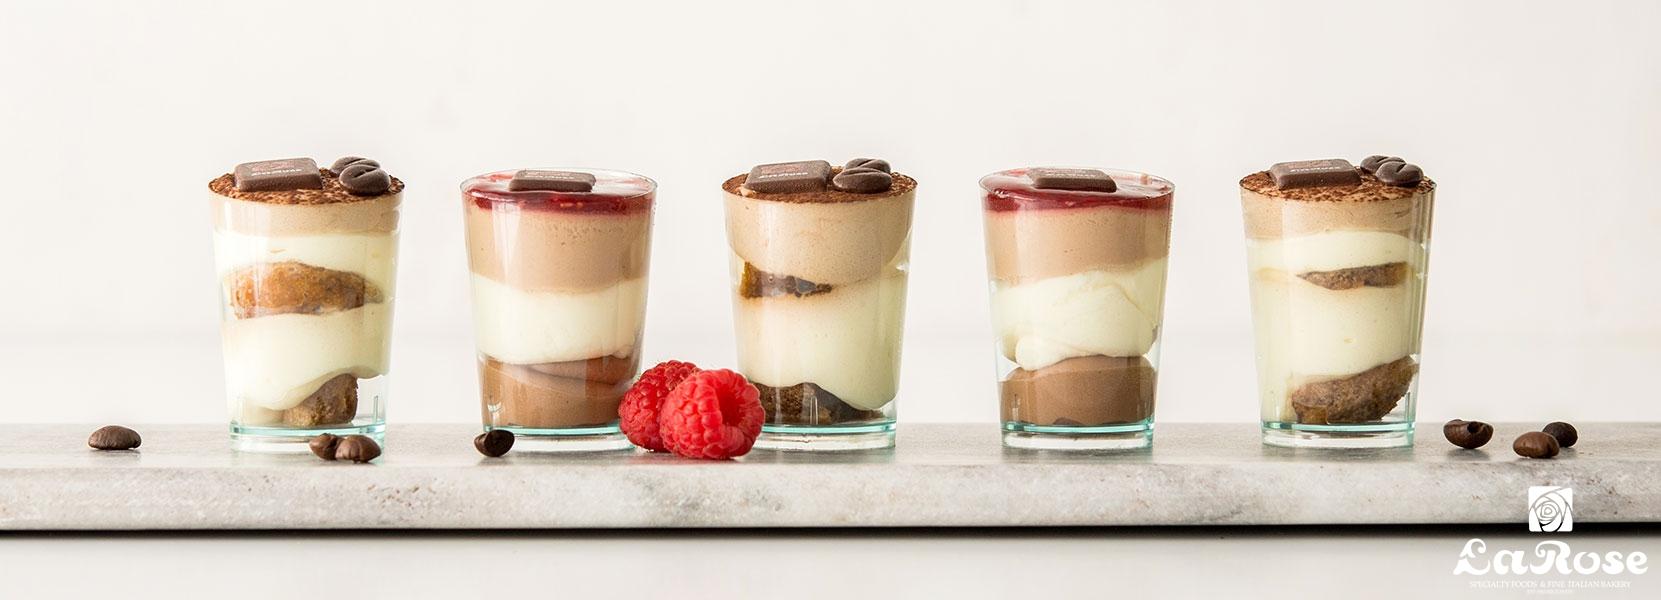 La Rose Individual Tiramisu and Triple Chocolate Mousse